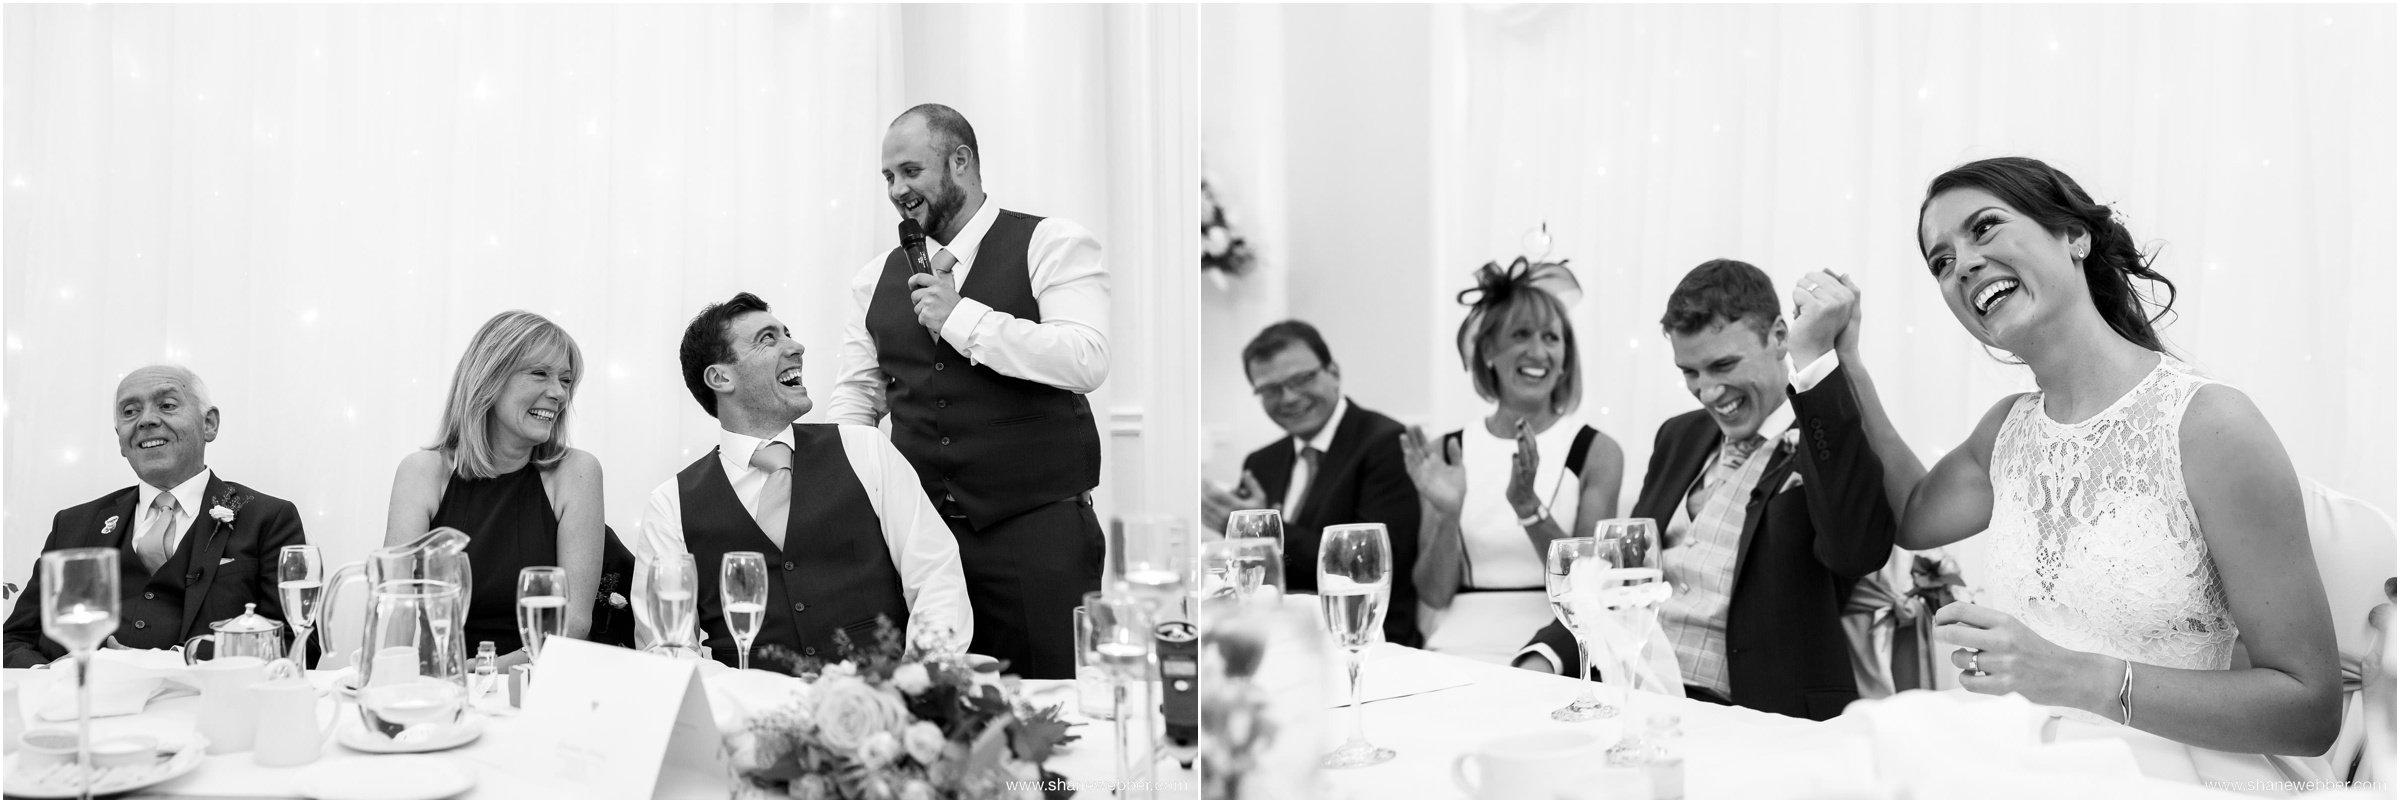 wedding photography speeches